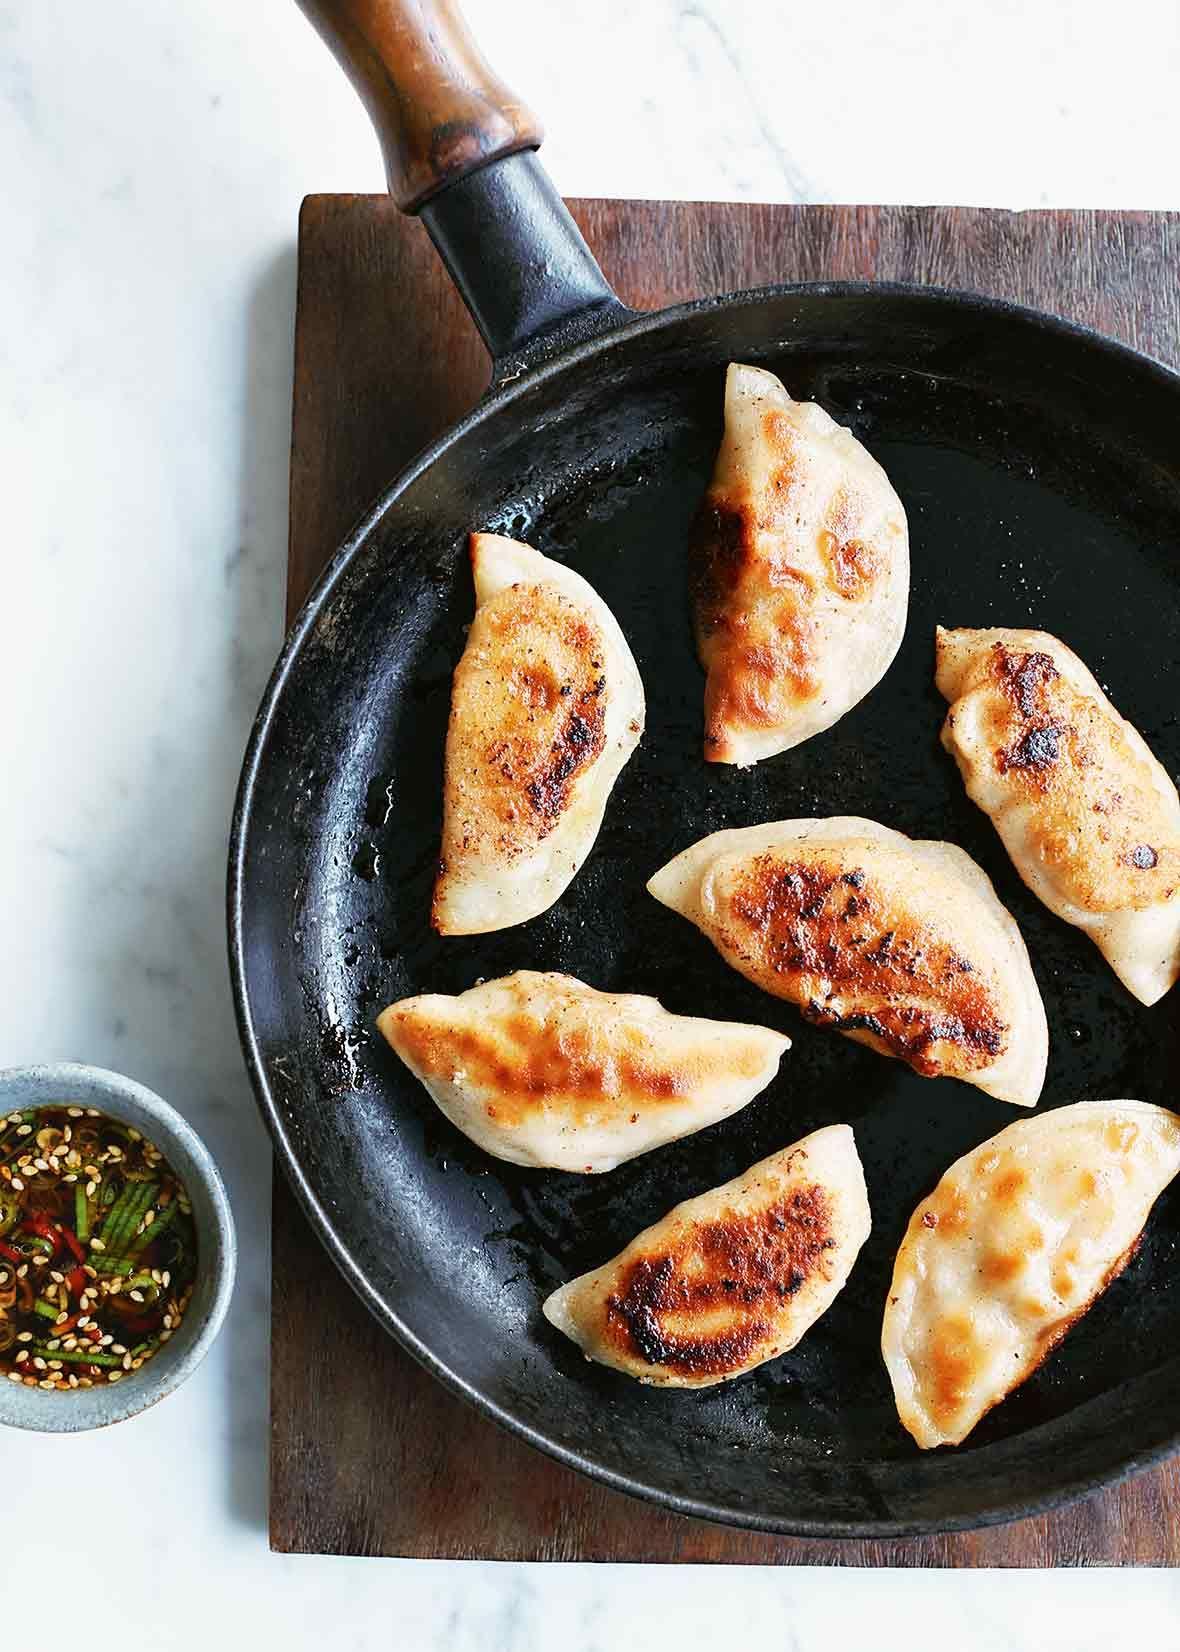 Pork dumplings recipe pork korean food recipes and korean pork dumplings recipes with tofueasy chinese recipesbaby food forumfinder Images